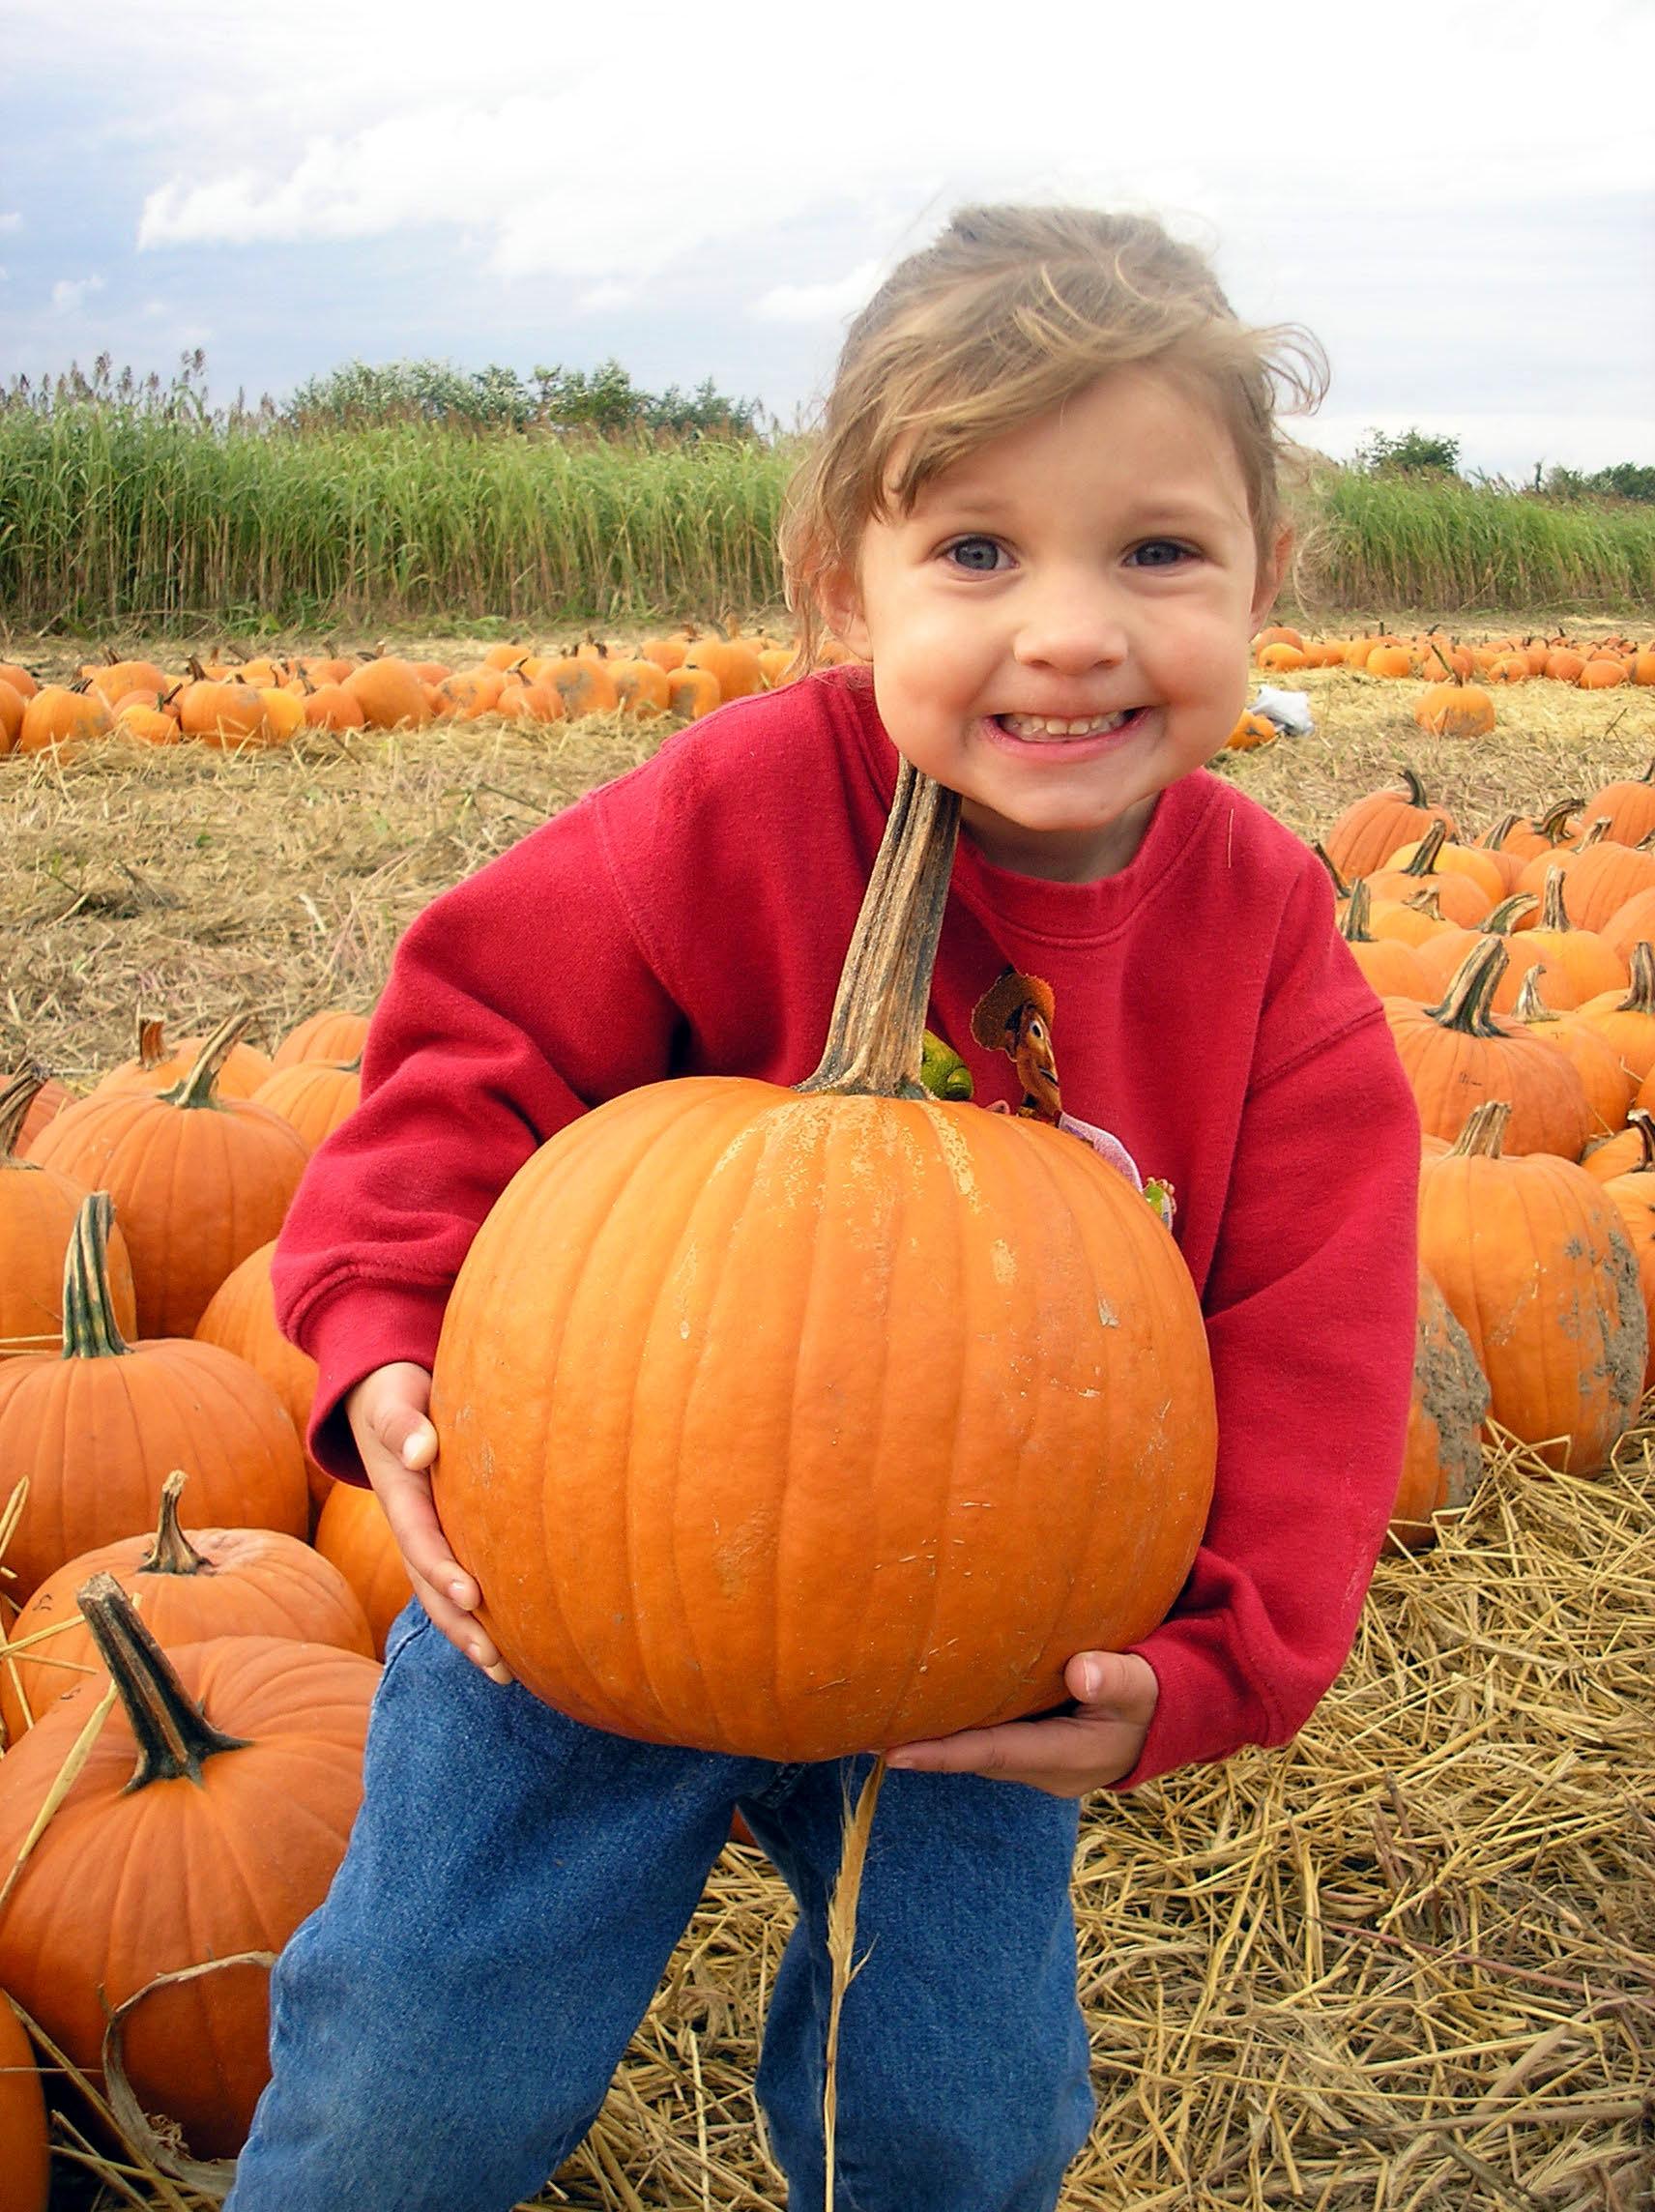 Boo! Halloween Fun With Your Kids